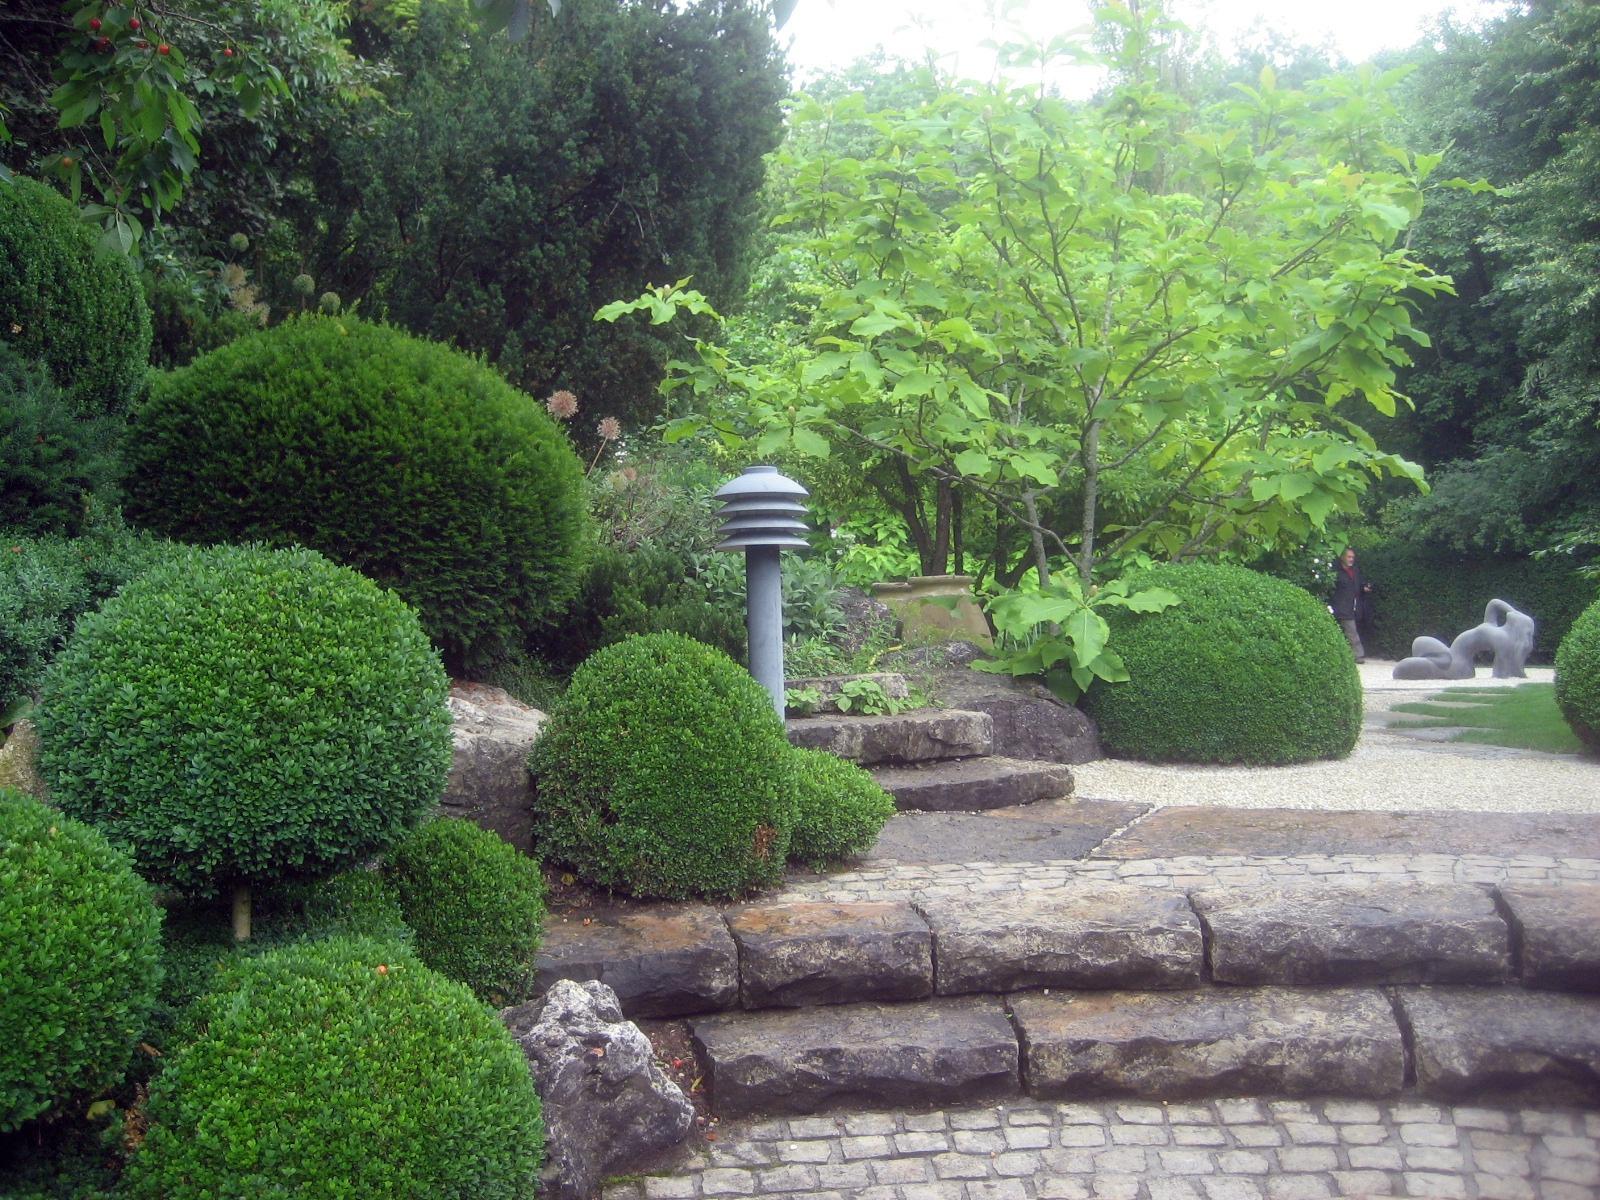 Marie Simone Professor Doschkas Garten In Dettingen